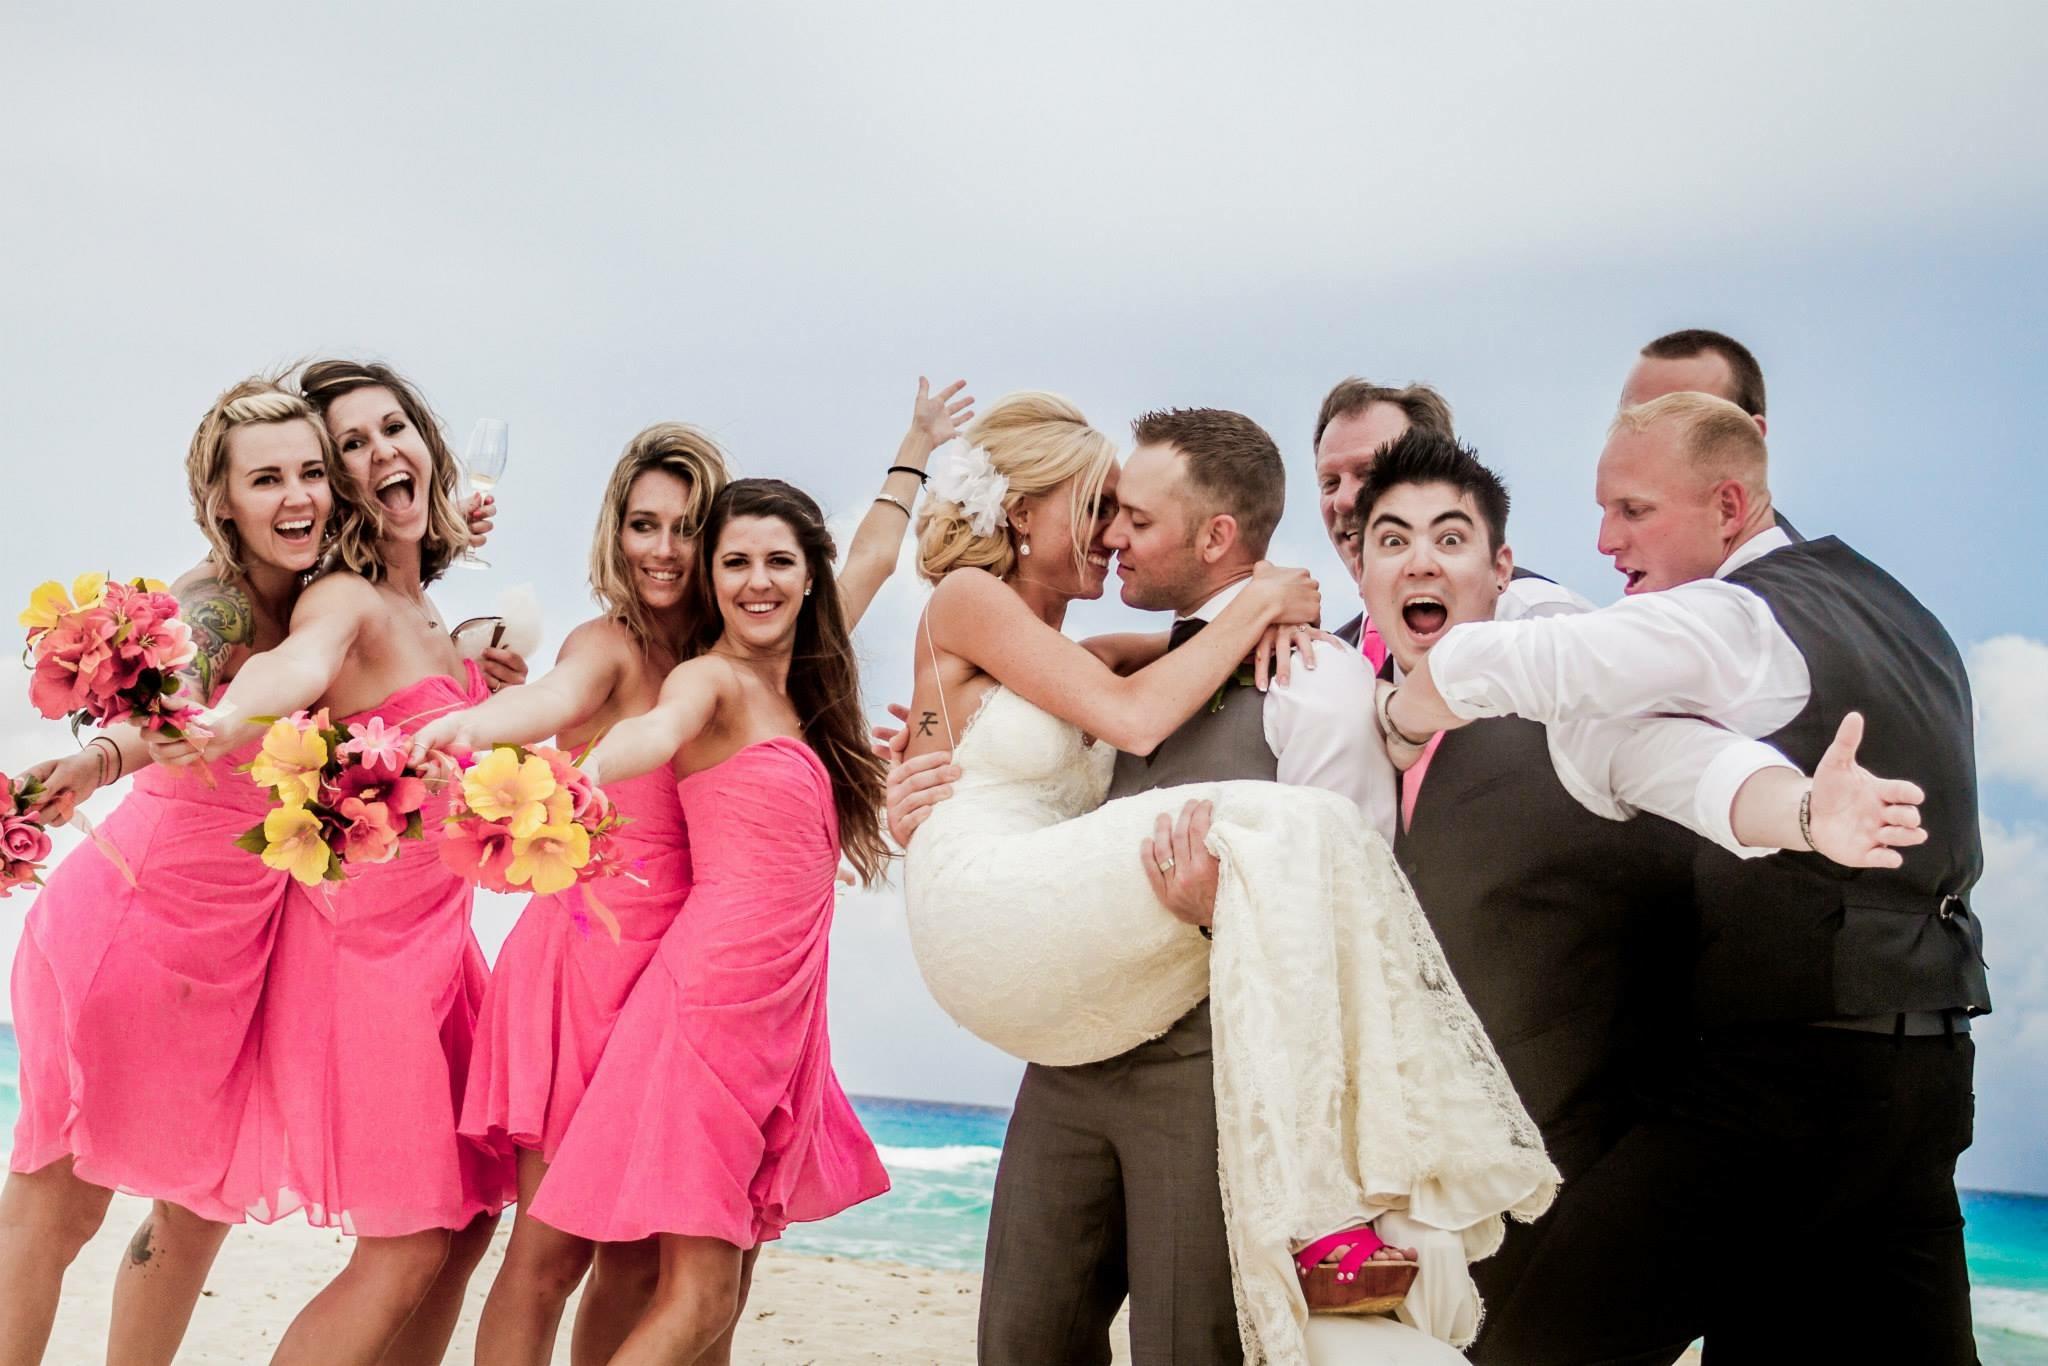 krysten-reed-cancun-beach-wedding-14.JPG